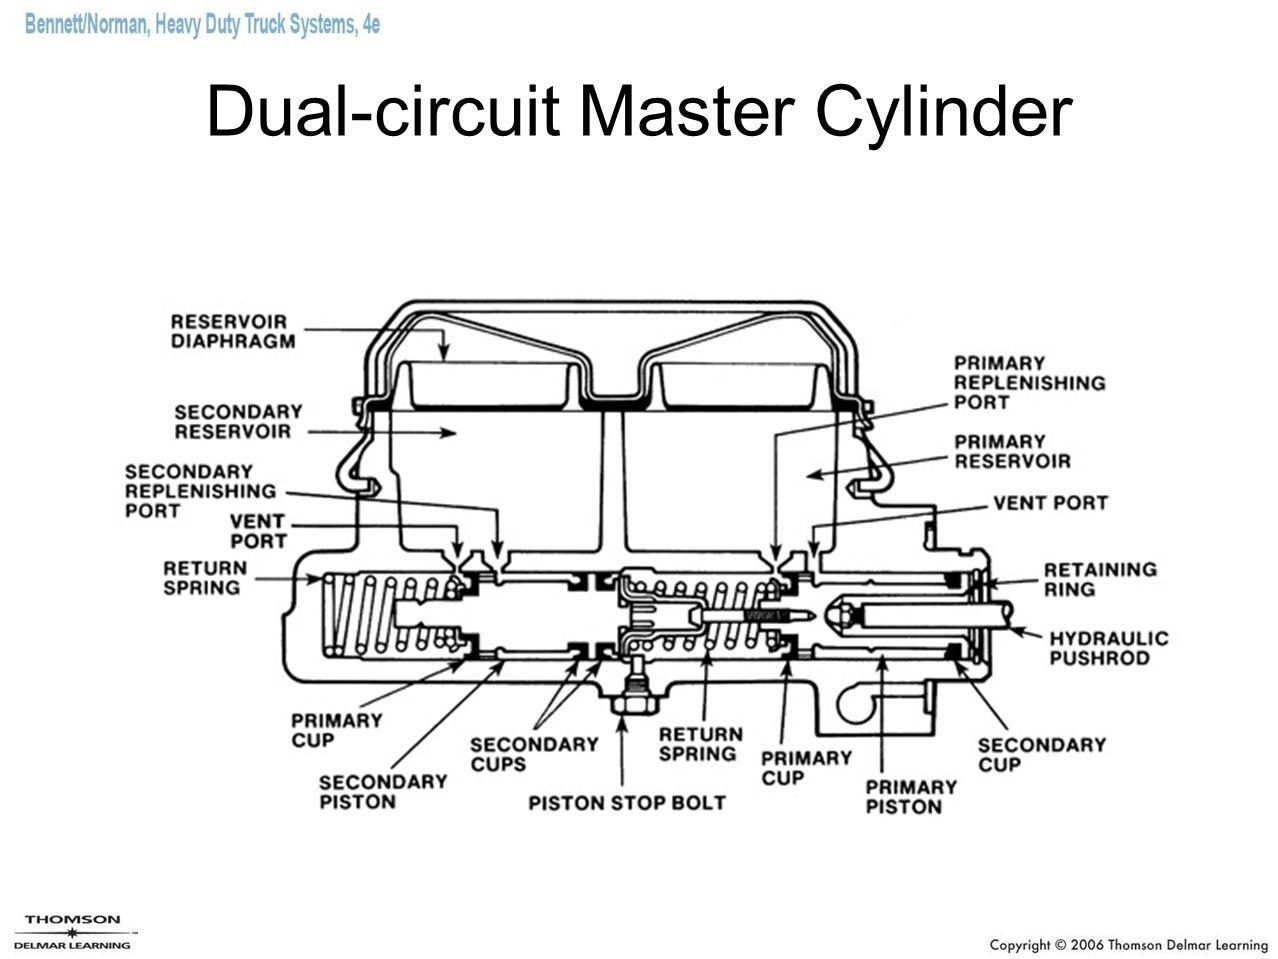 Dual-circuit Master Cylinder